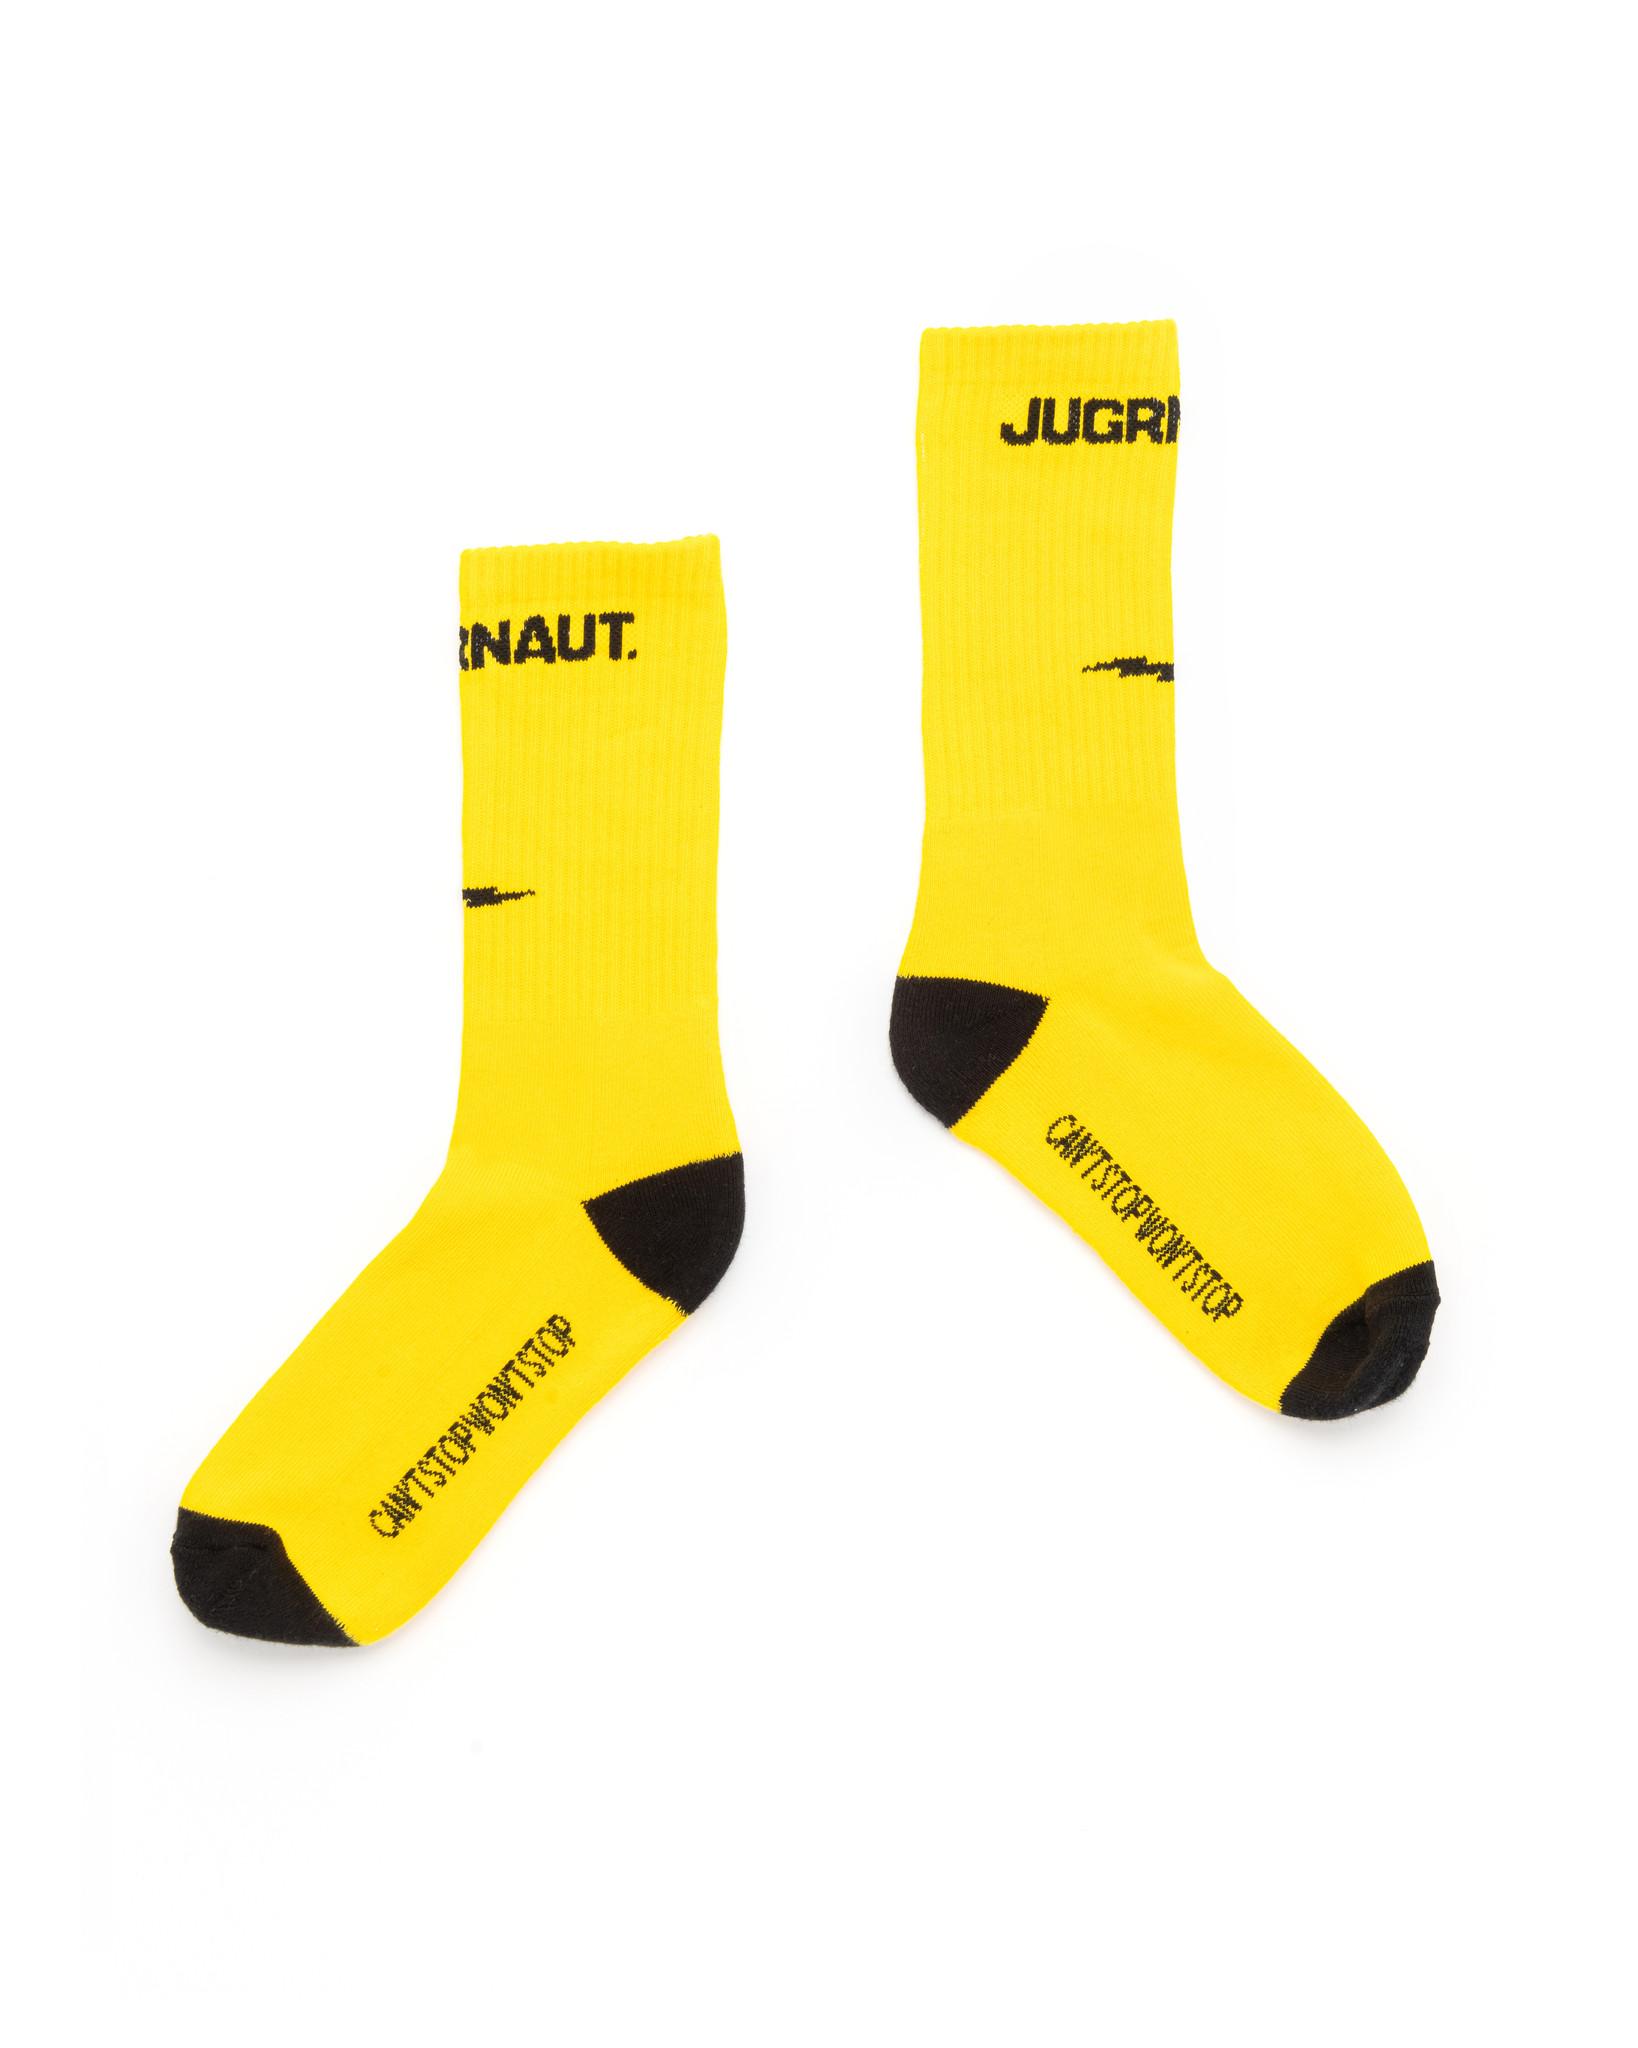 Jugrnaut Jugrnaut Bolt Socks yellow